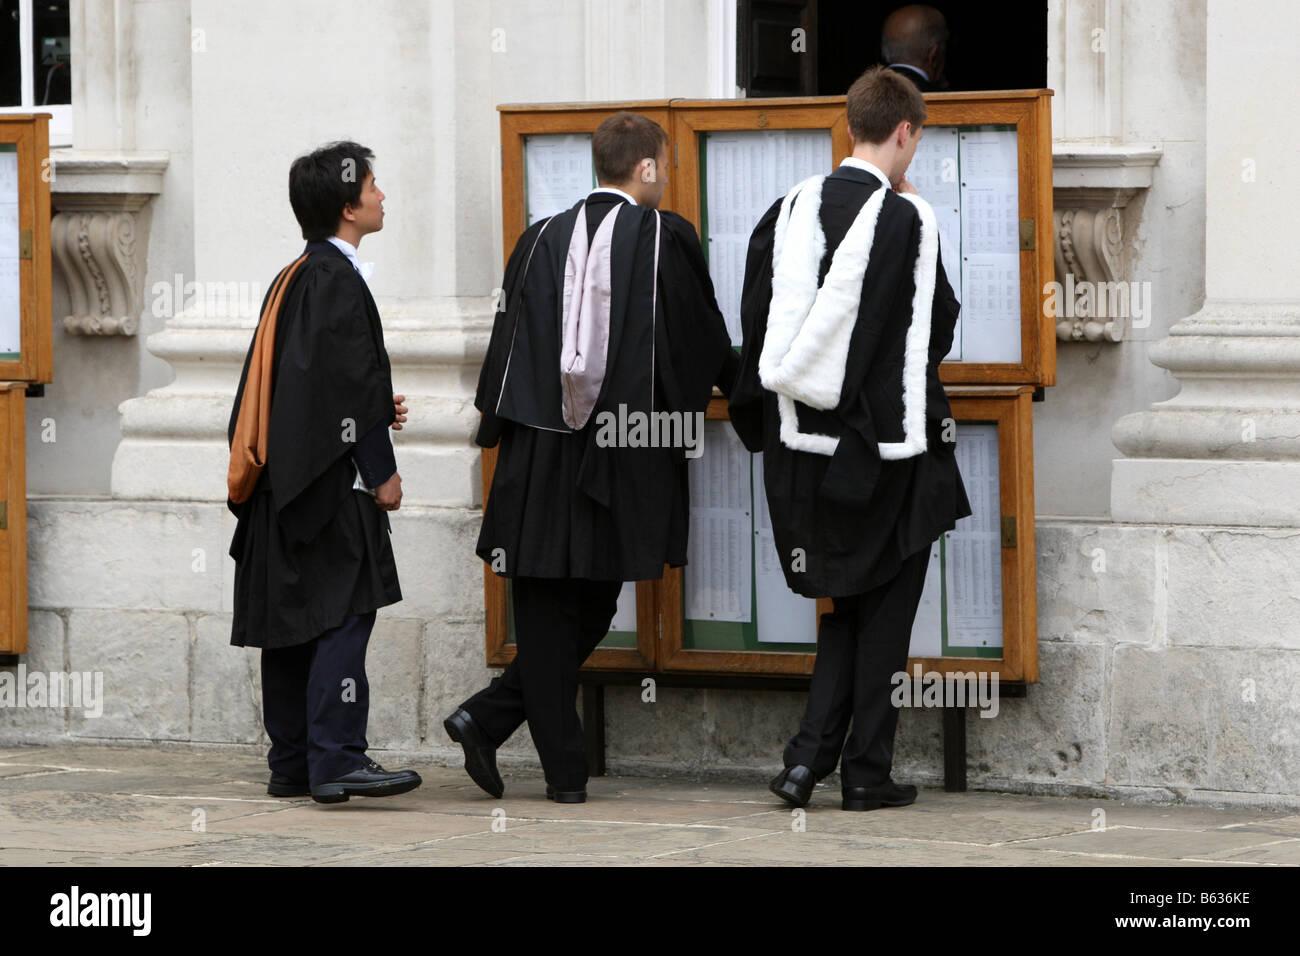 GRADUATION CEREMONY FOR STUDENTS AT CAMBRIDGE UNIVERSITY - Stock Image